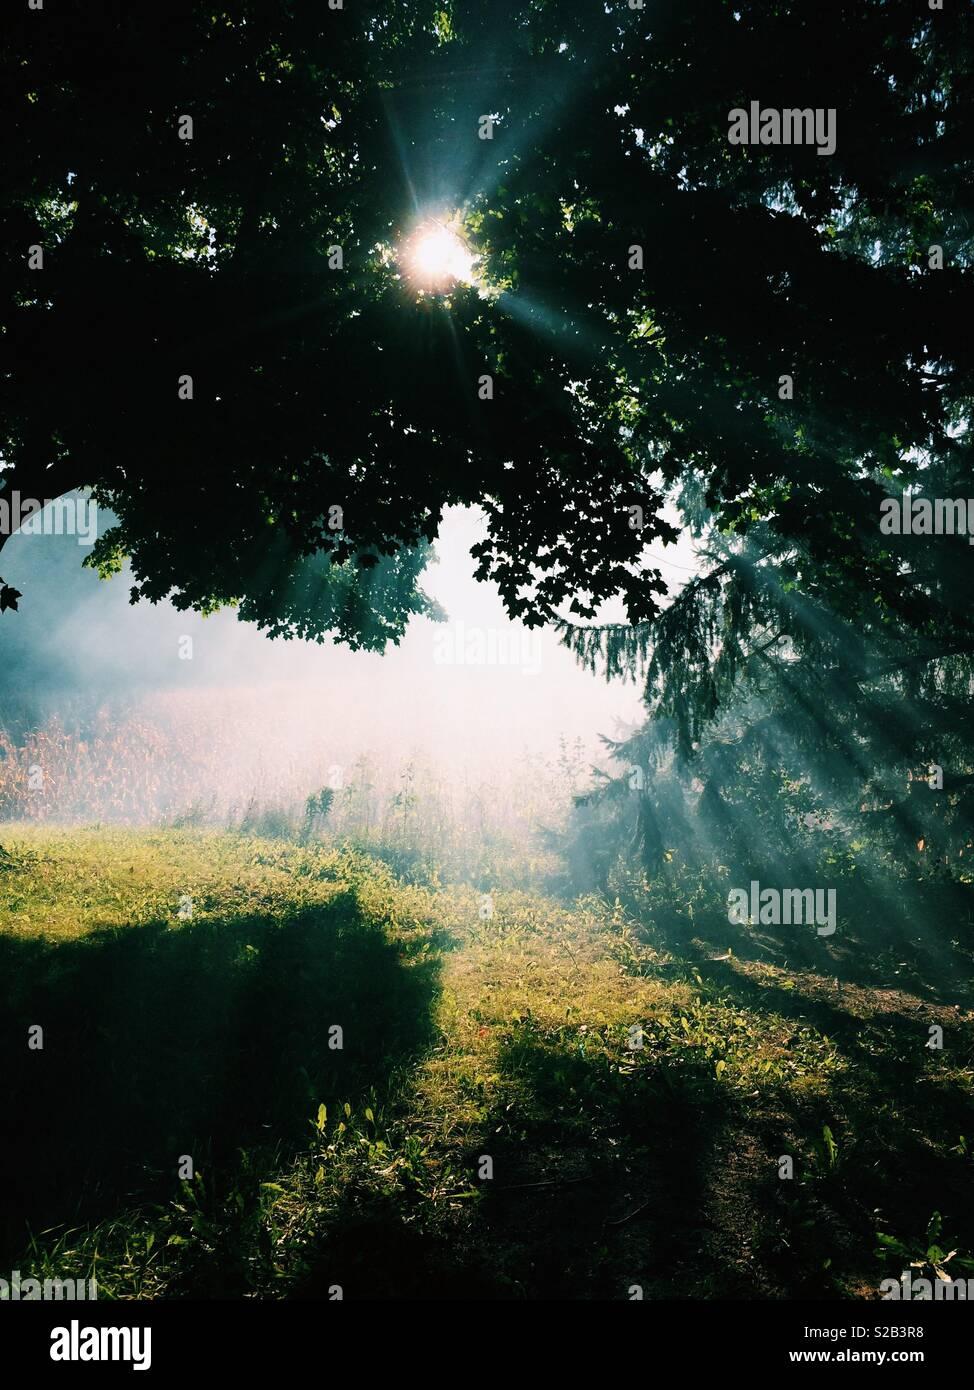 Llamarada Solar a través de árboles en un entorno rural. Imagen De Stock